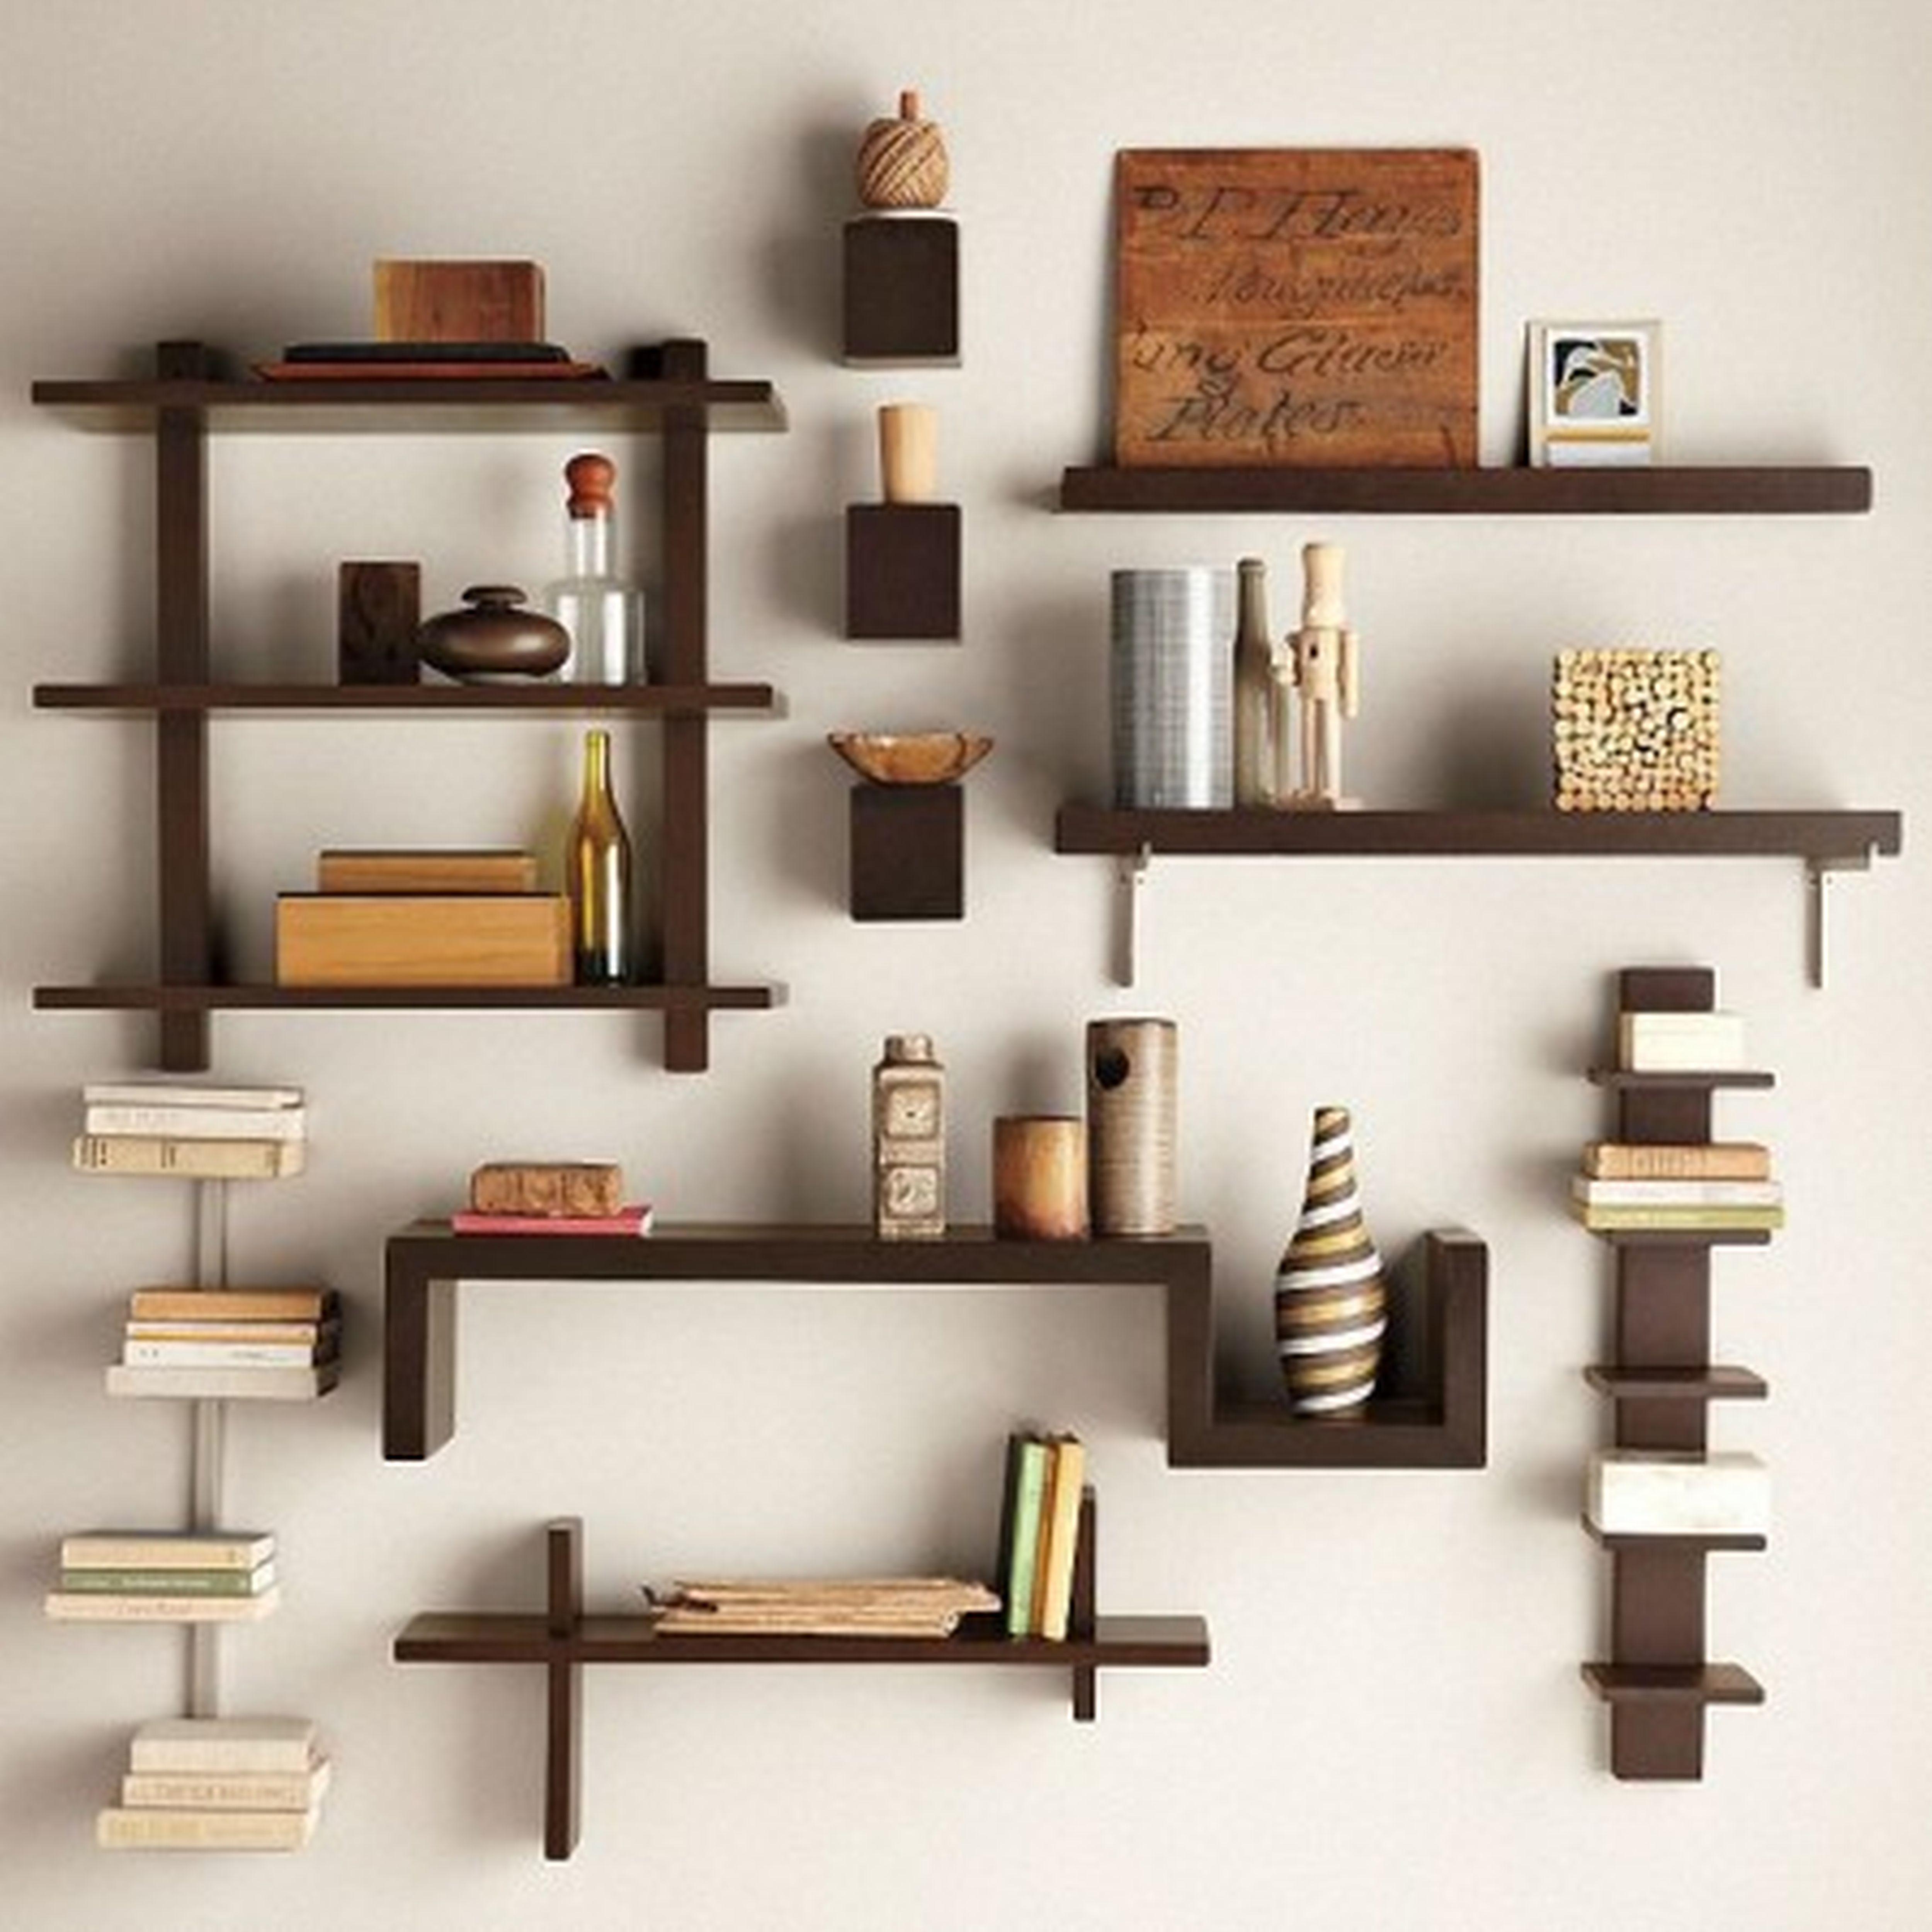 Living Room Shelves Design Top 3 Design Trends Out Of Tse2015 Toronto Special Events